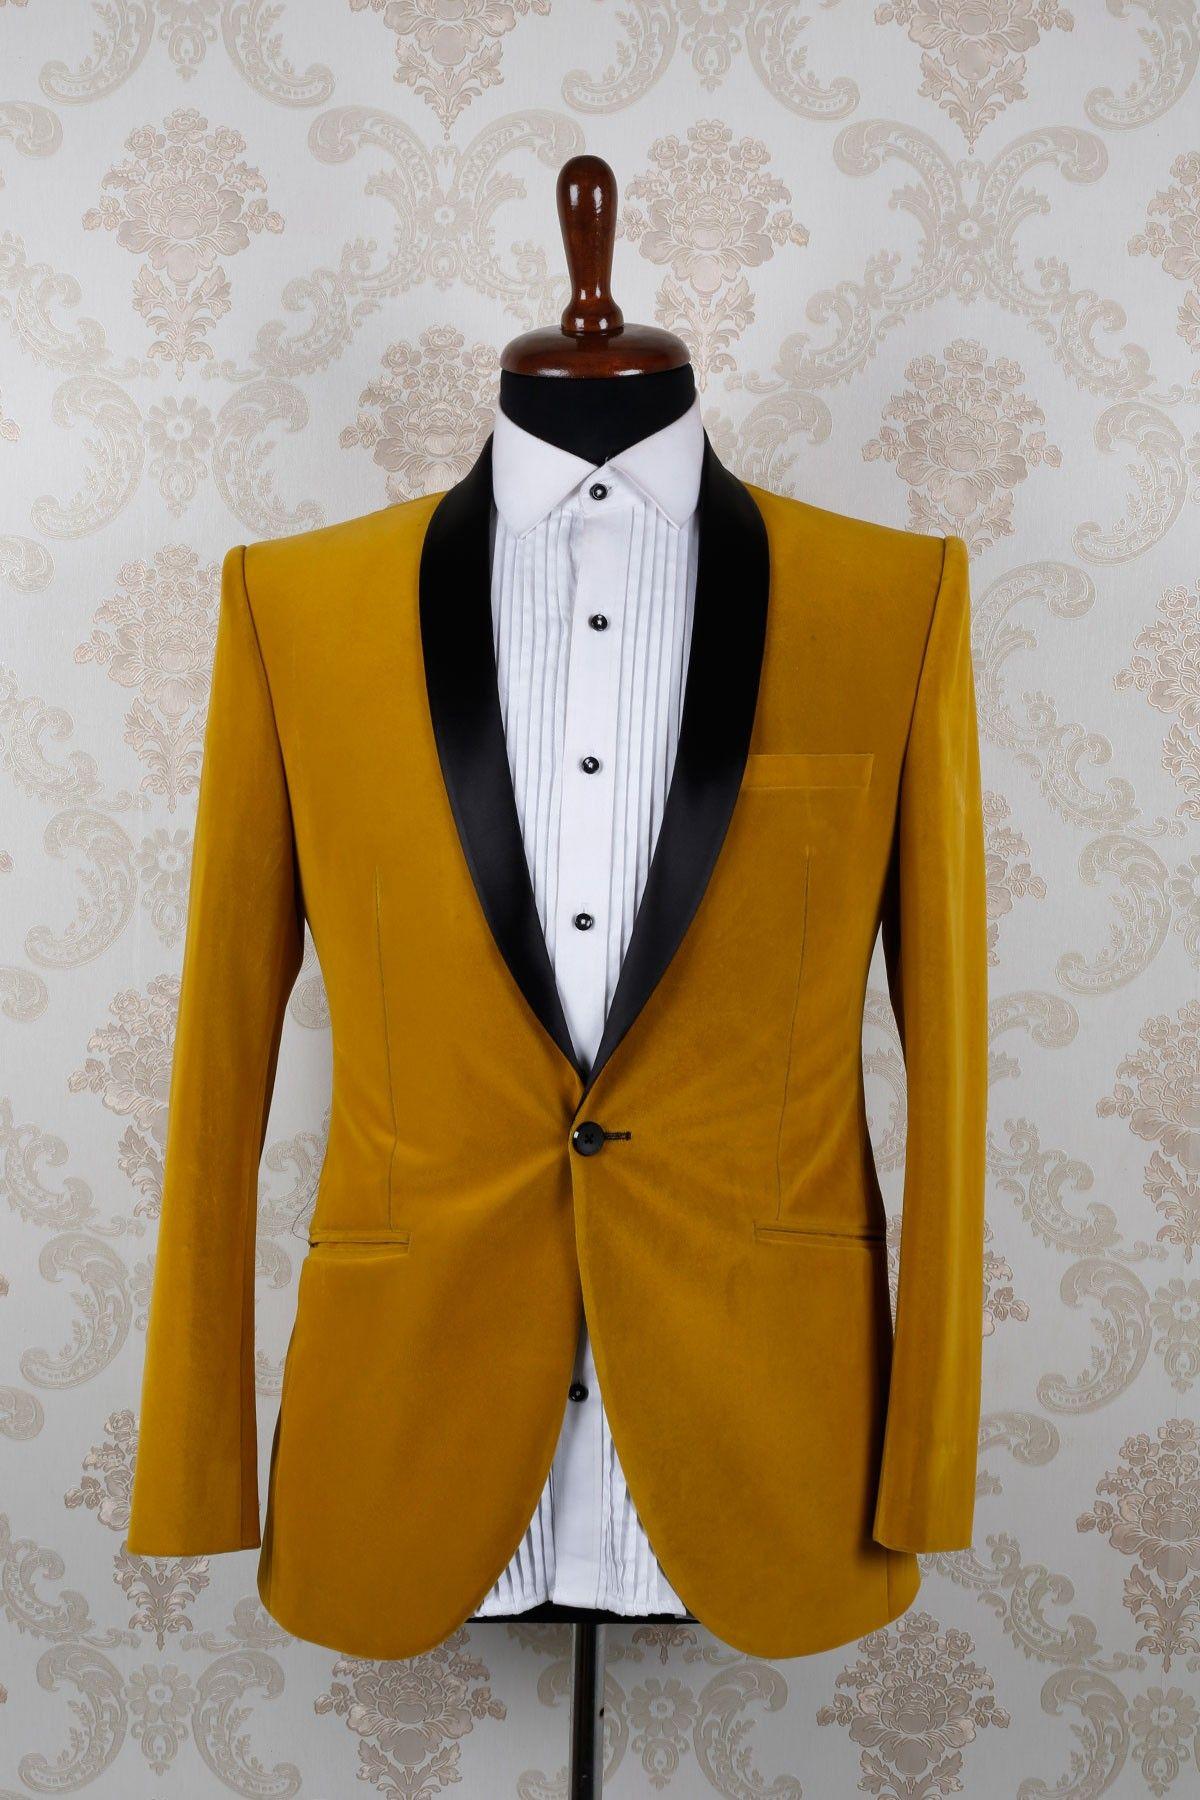 Mustard Yellow Velvet Slim Fit Aesthetic Suit With Shawl Lapel Dasi Bowtie Tie Knit Wedding Best Man Self Bow Purple Flower St402